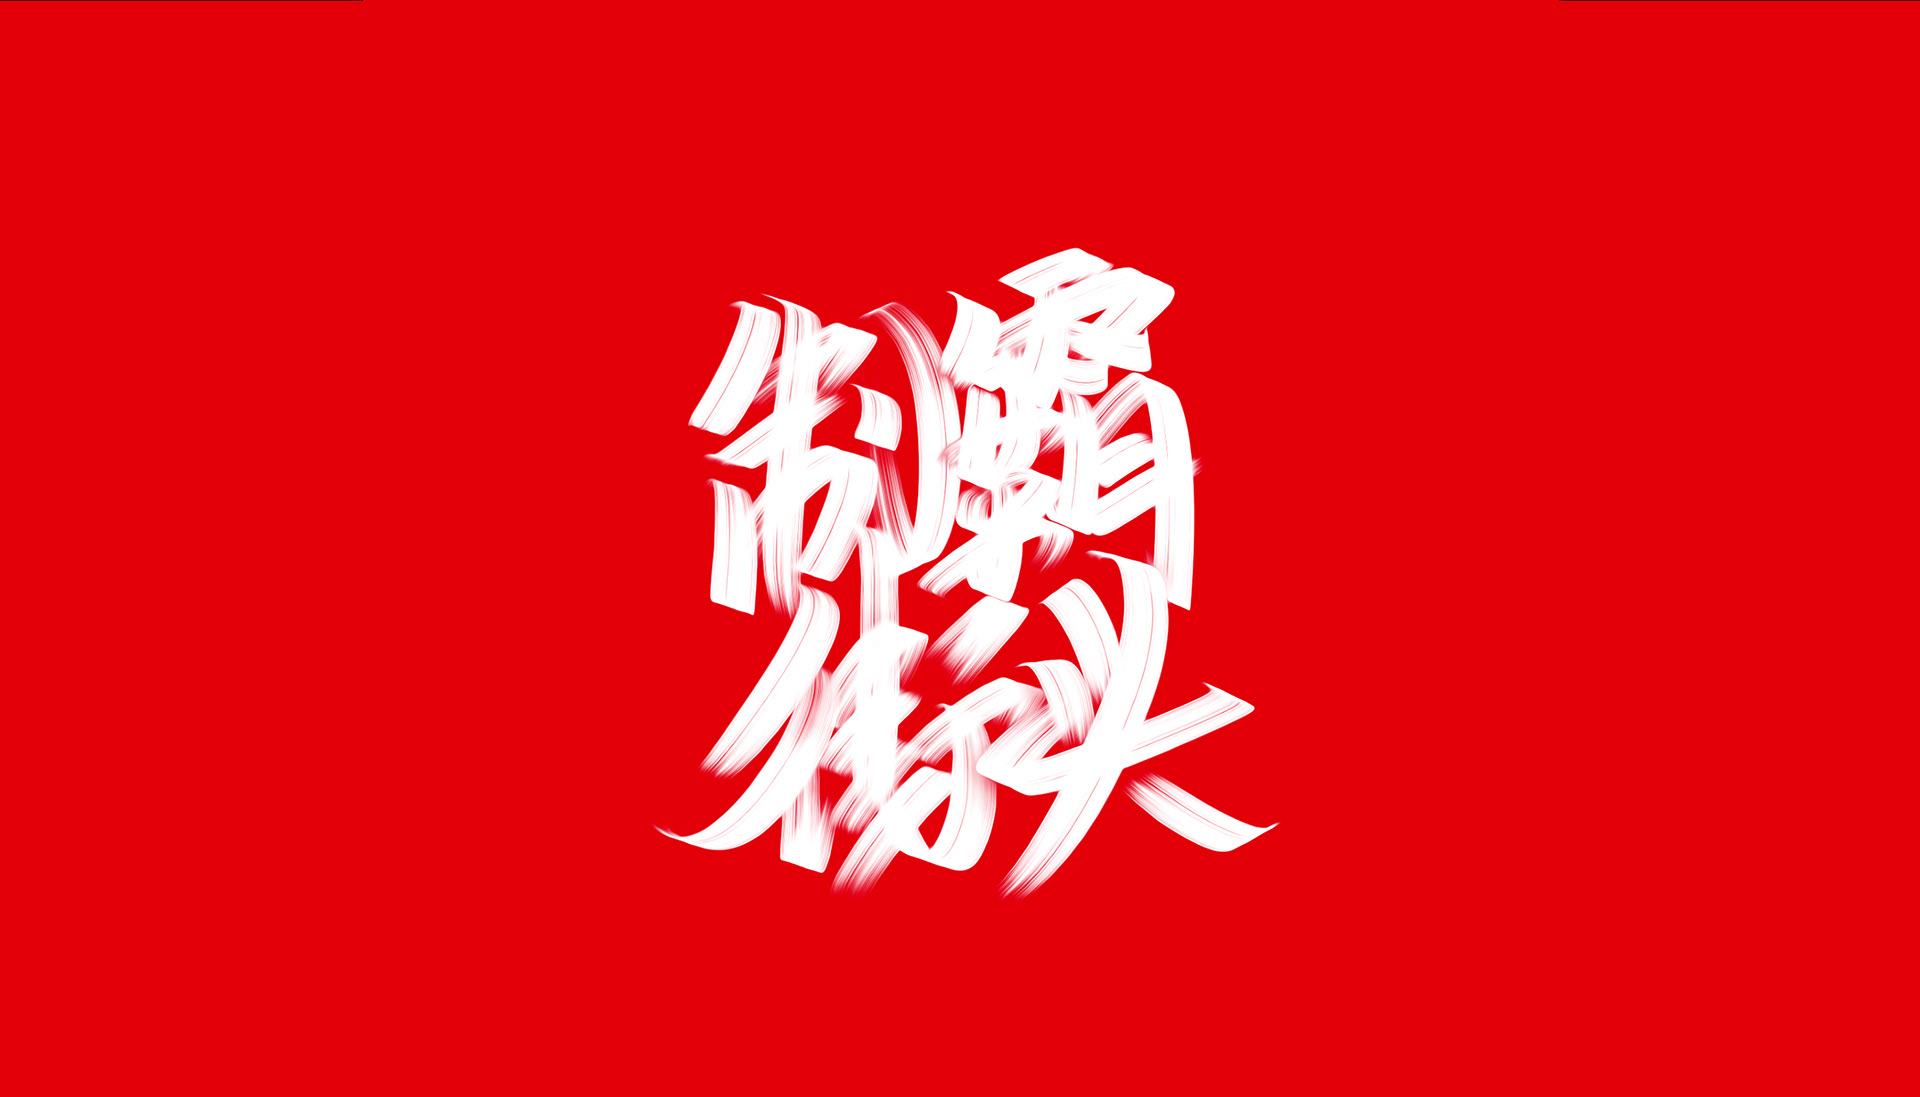 Calligraphy,Graphic Design,Typography